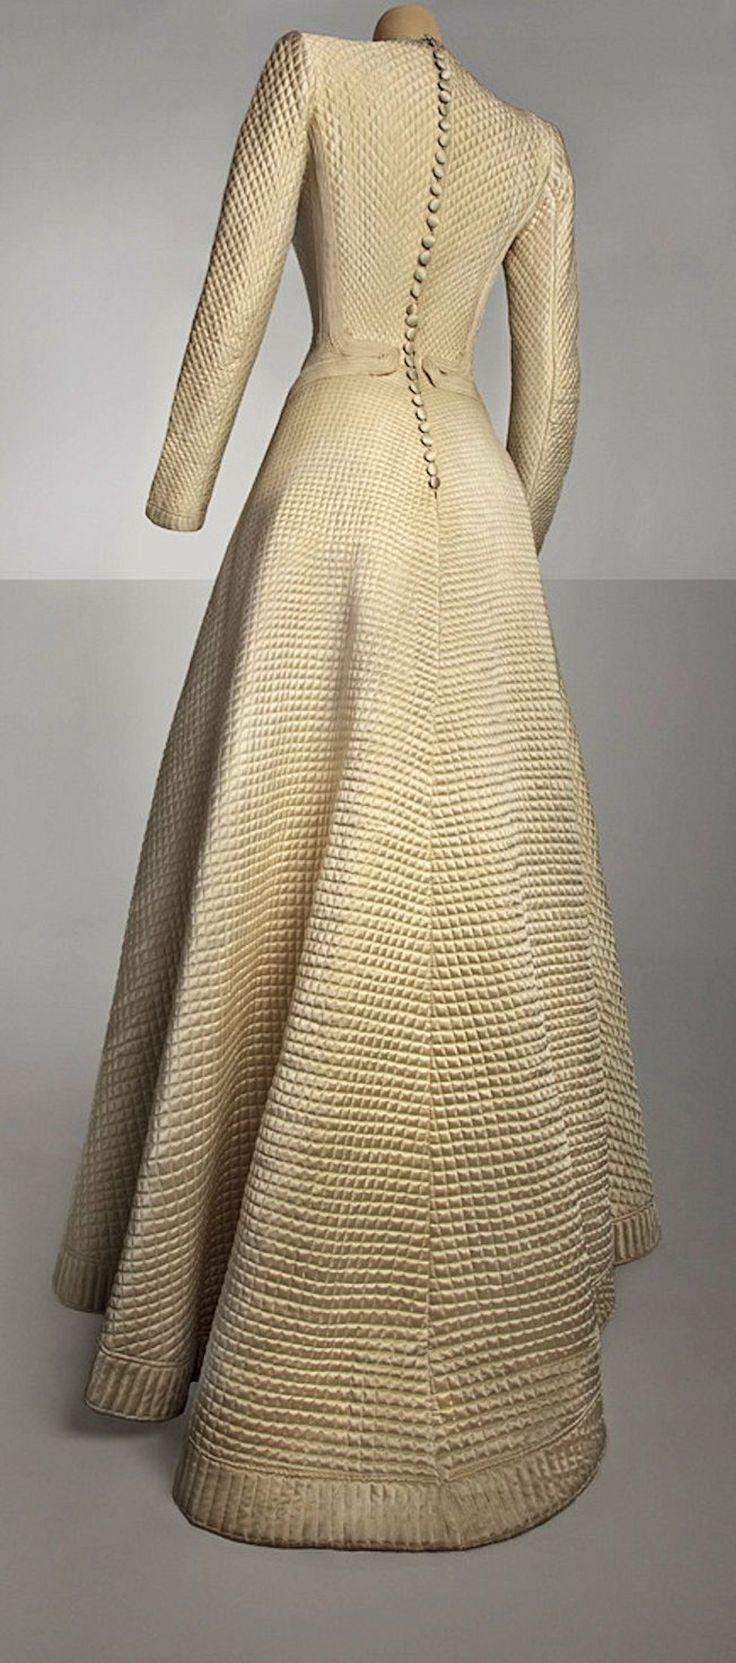 1944 Bruyère wedding dress (back view), via Palais Galliera, Museum of Fashion.